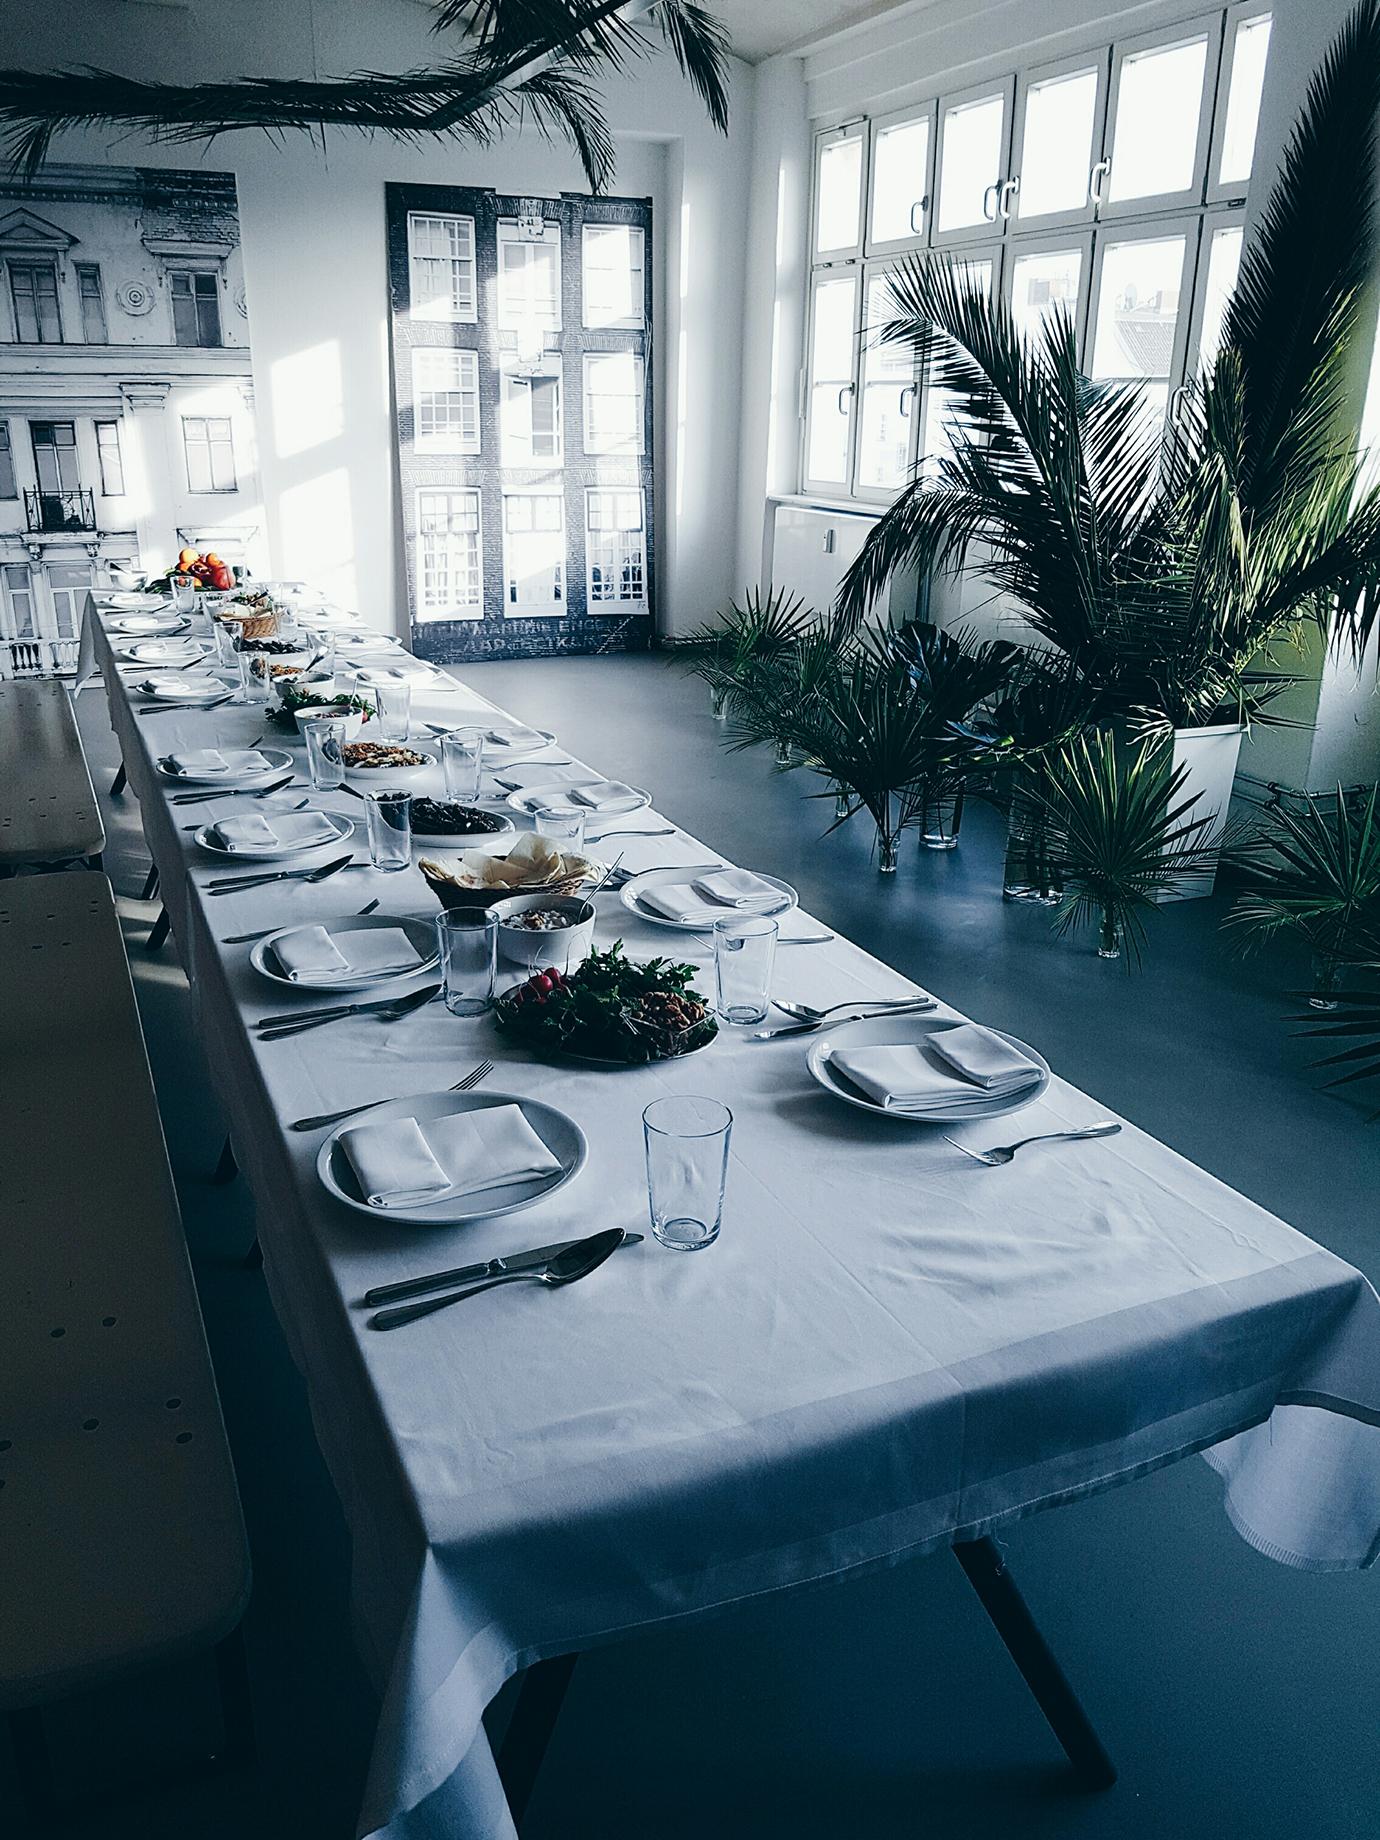 7things_47_lala_berlin_lunch